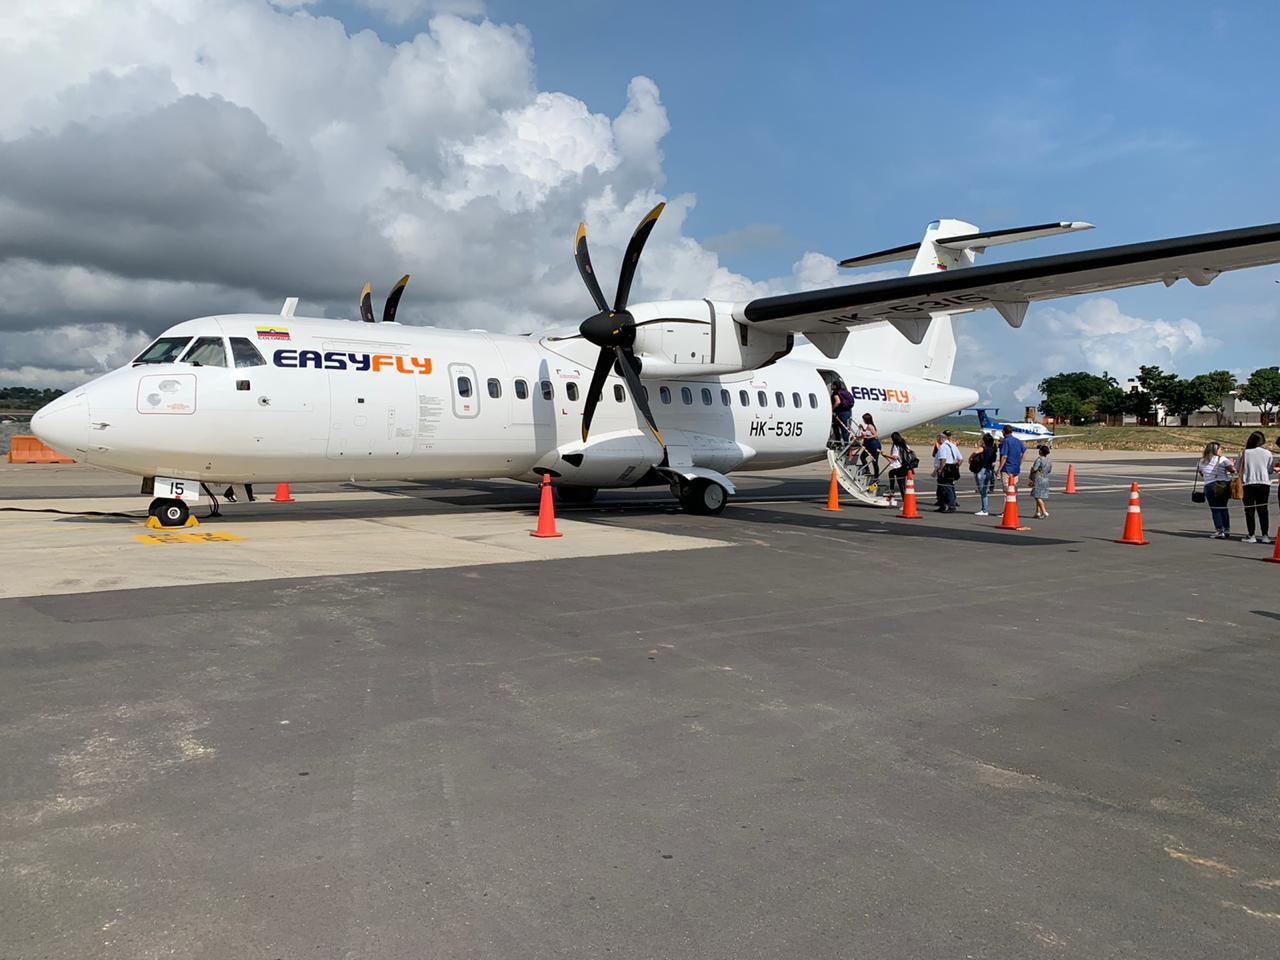 Easyfly FLOTA ATR